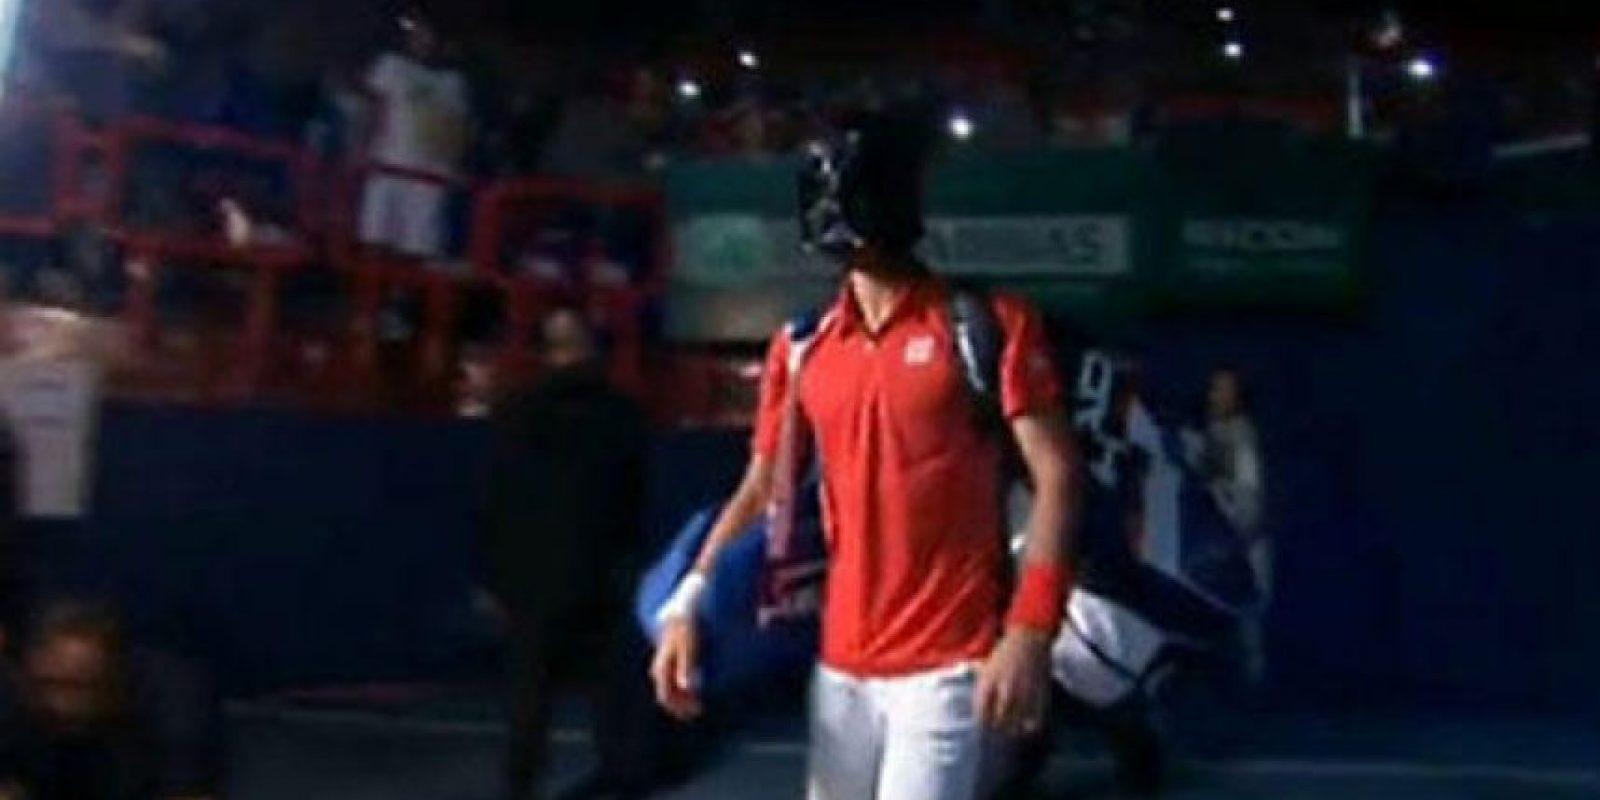 El número 1 del tenis salió a la cancha con la mascara de Darth Vander. Foto:@Tenisenred